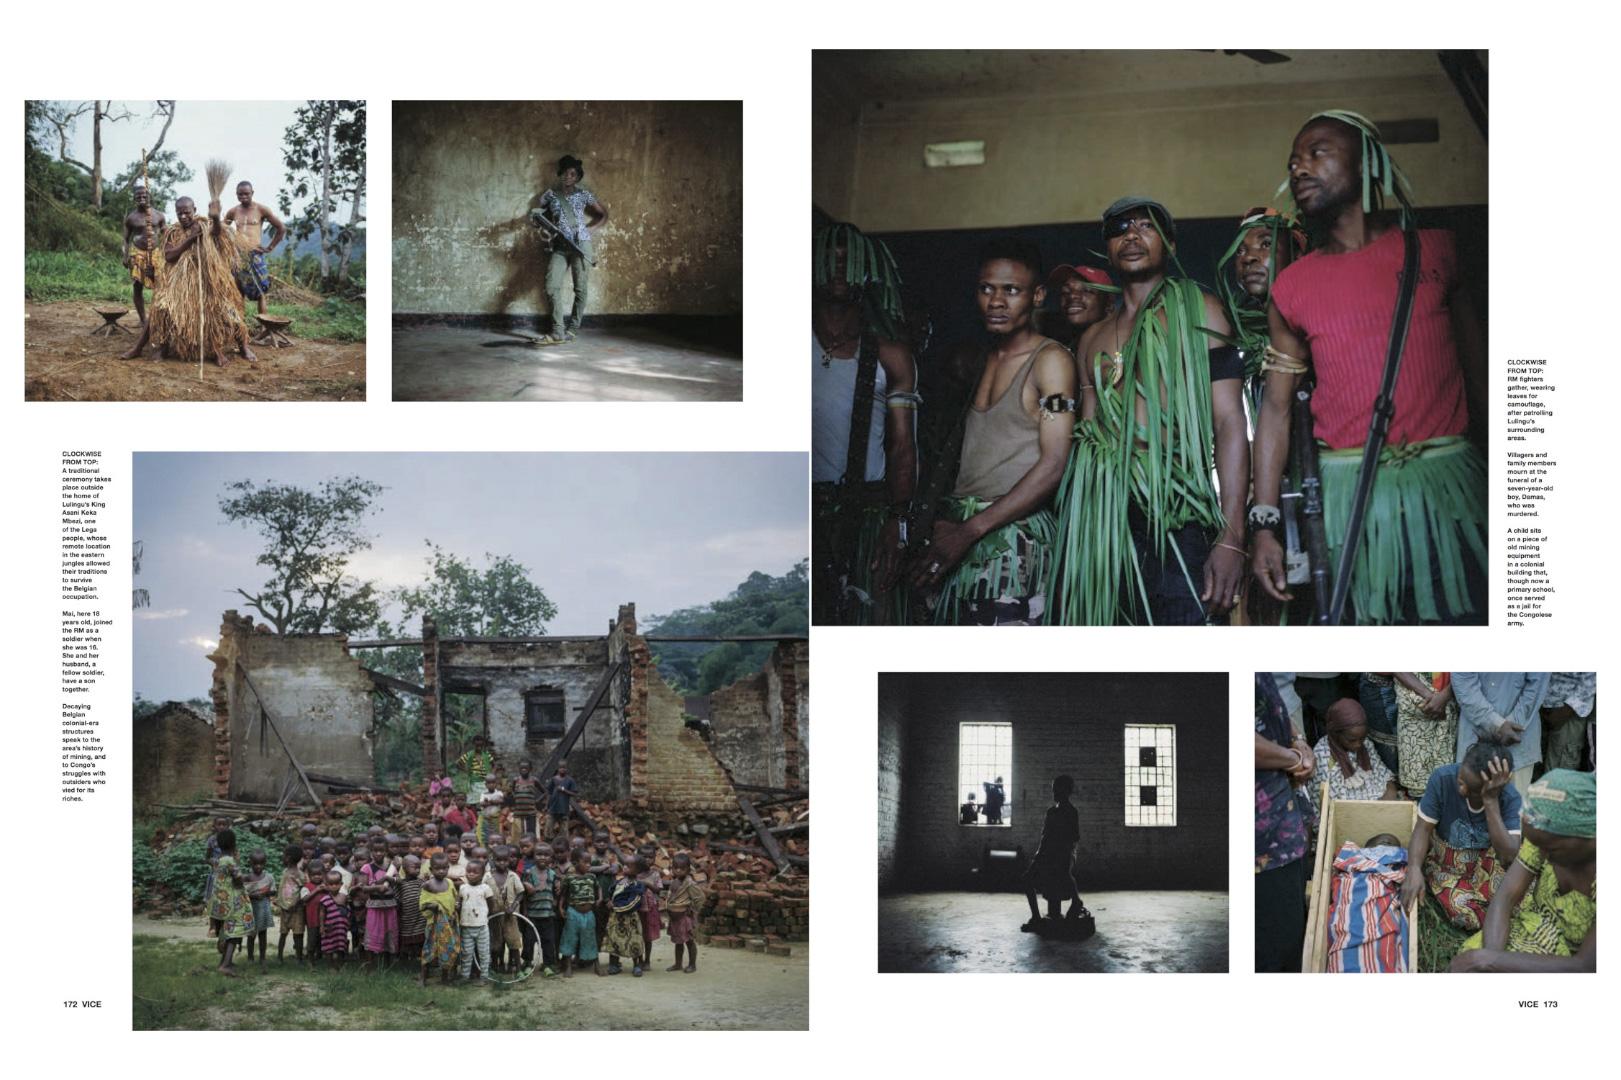 Diana Zeyneb Alhindawi_VICE Annual Photo Issue 2016_raia mutomboki rebels congo drc_2.jpg